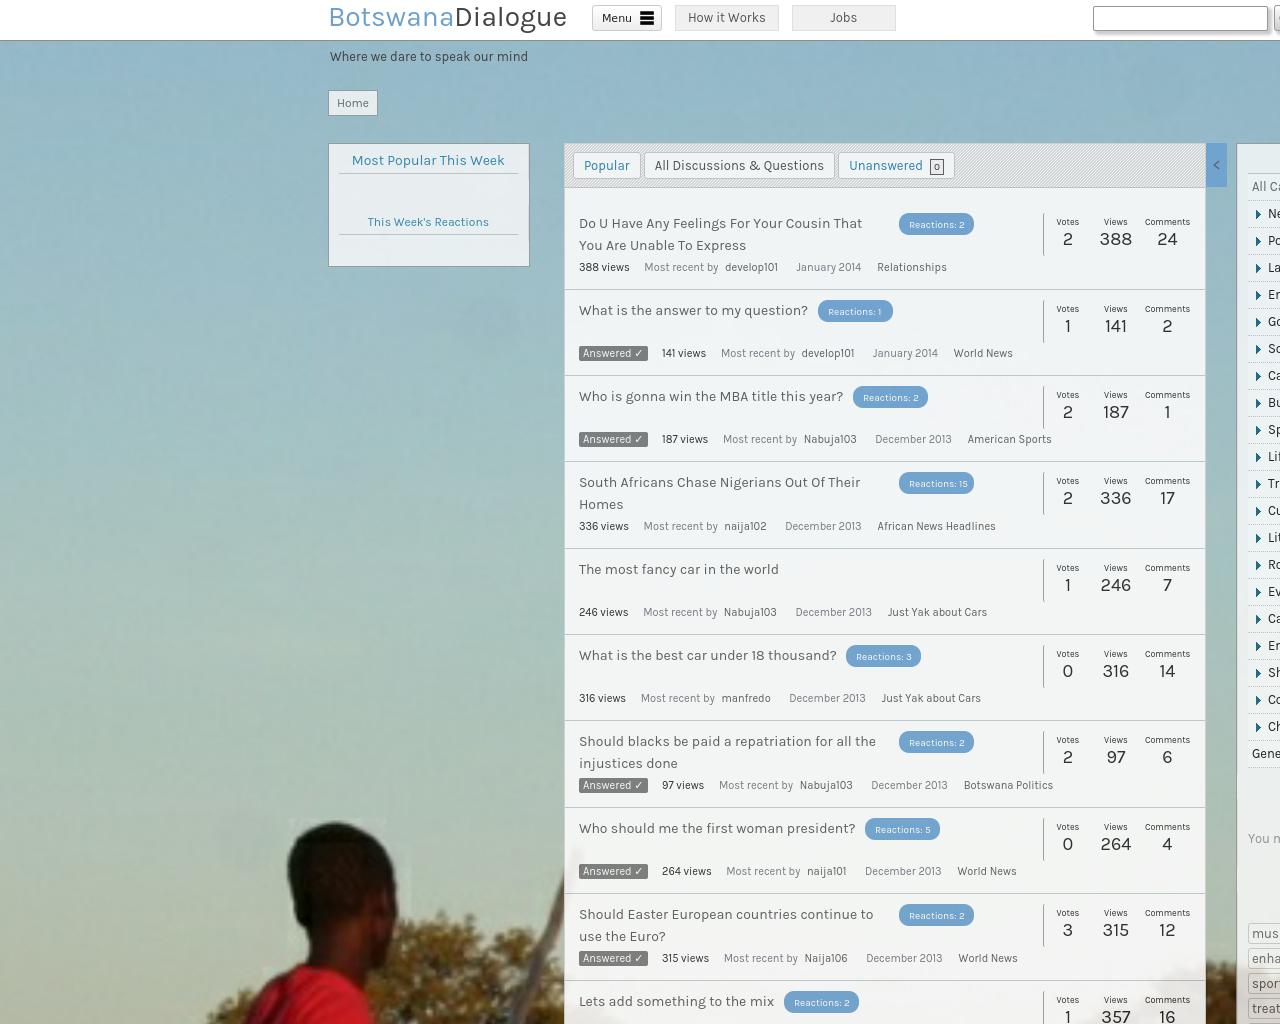 Botswana-Dialogue-Advertising-Reviews-Pricing